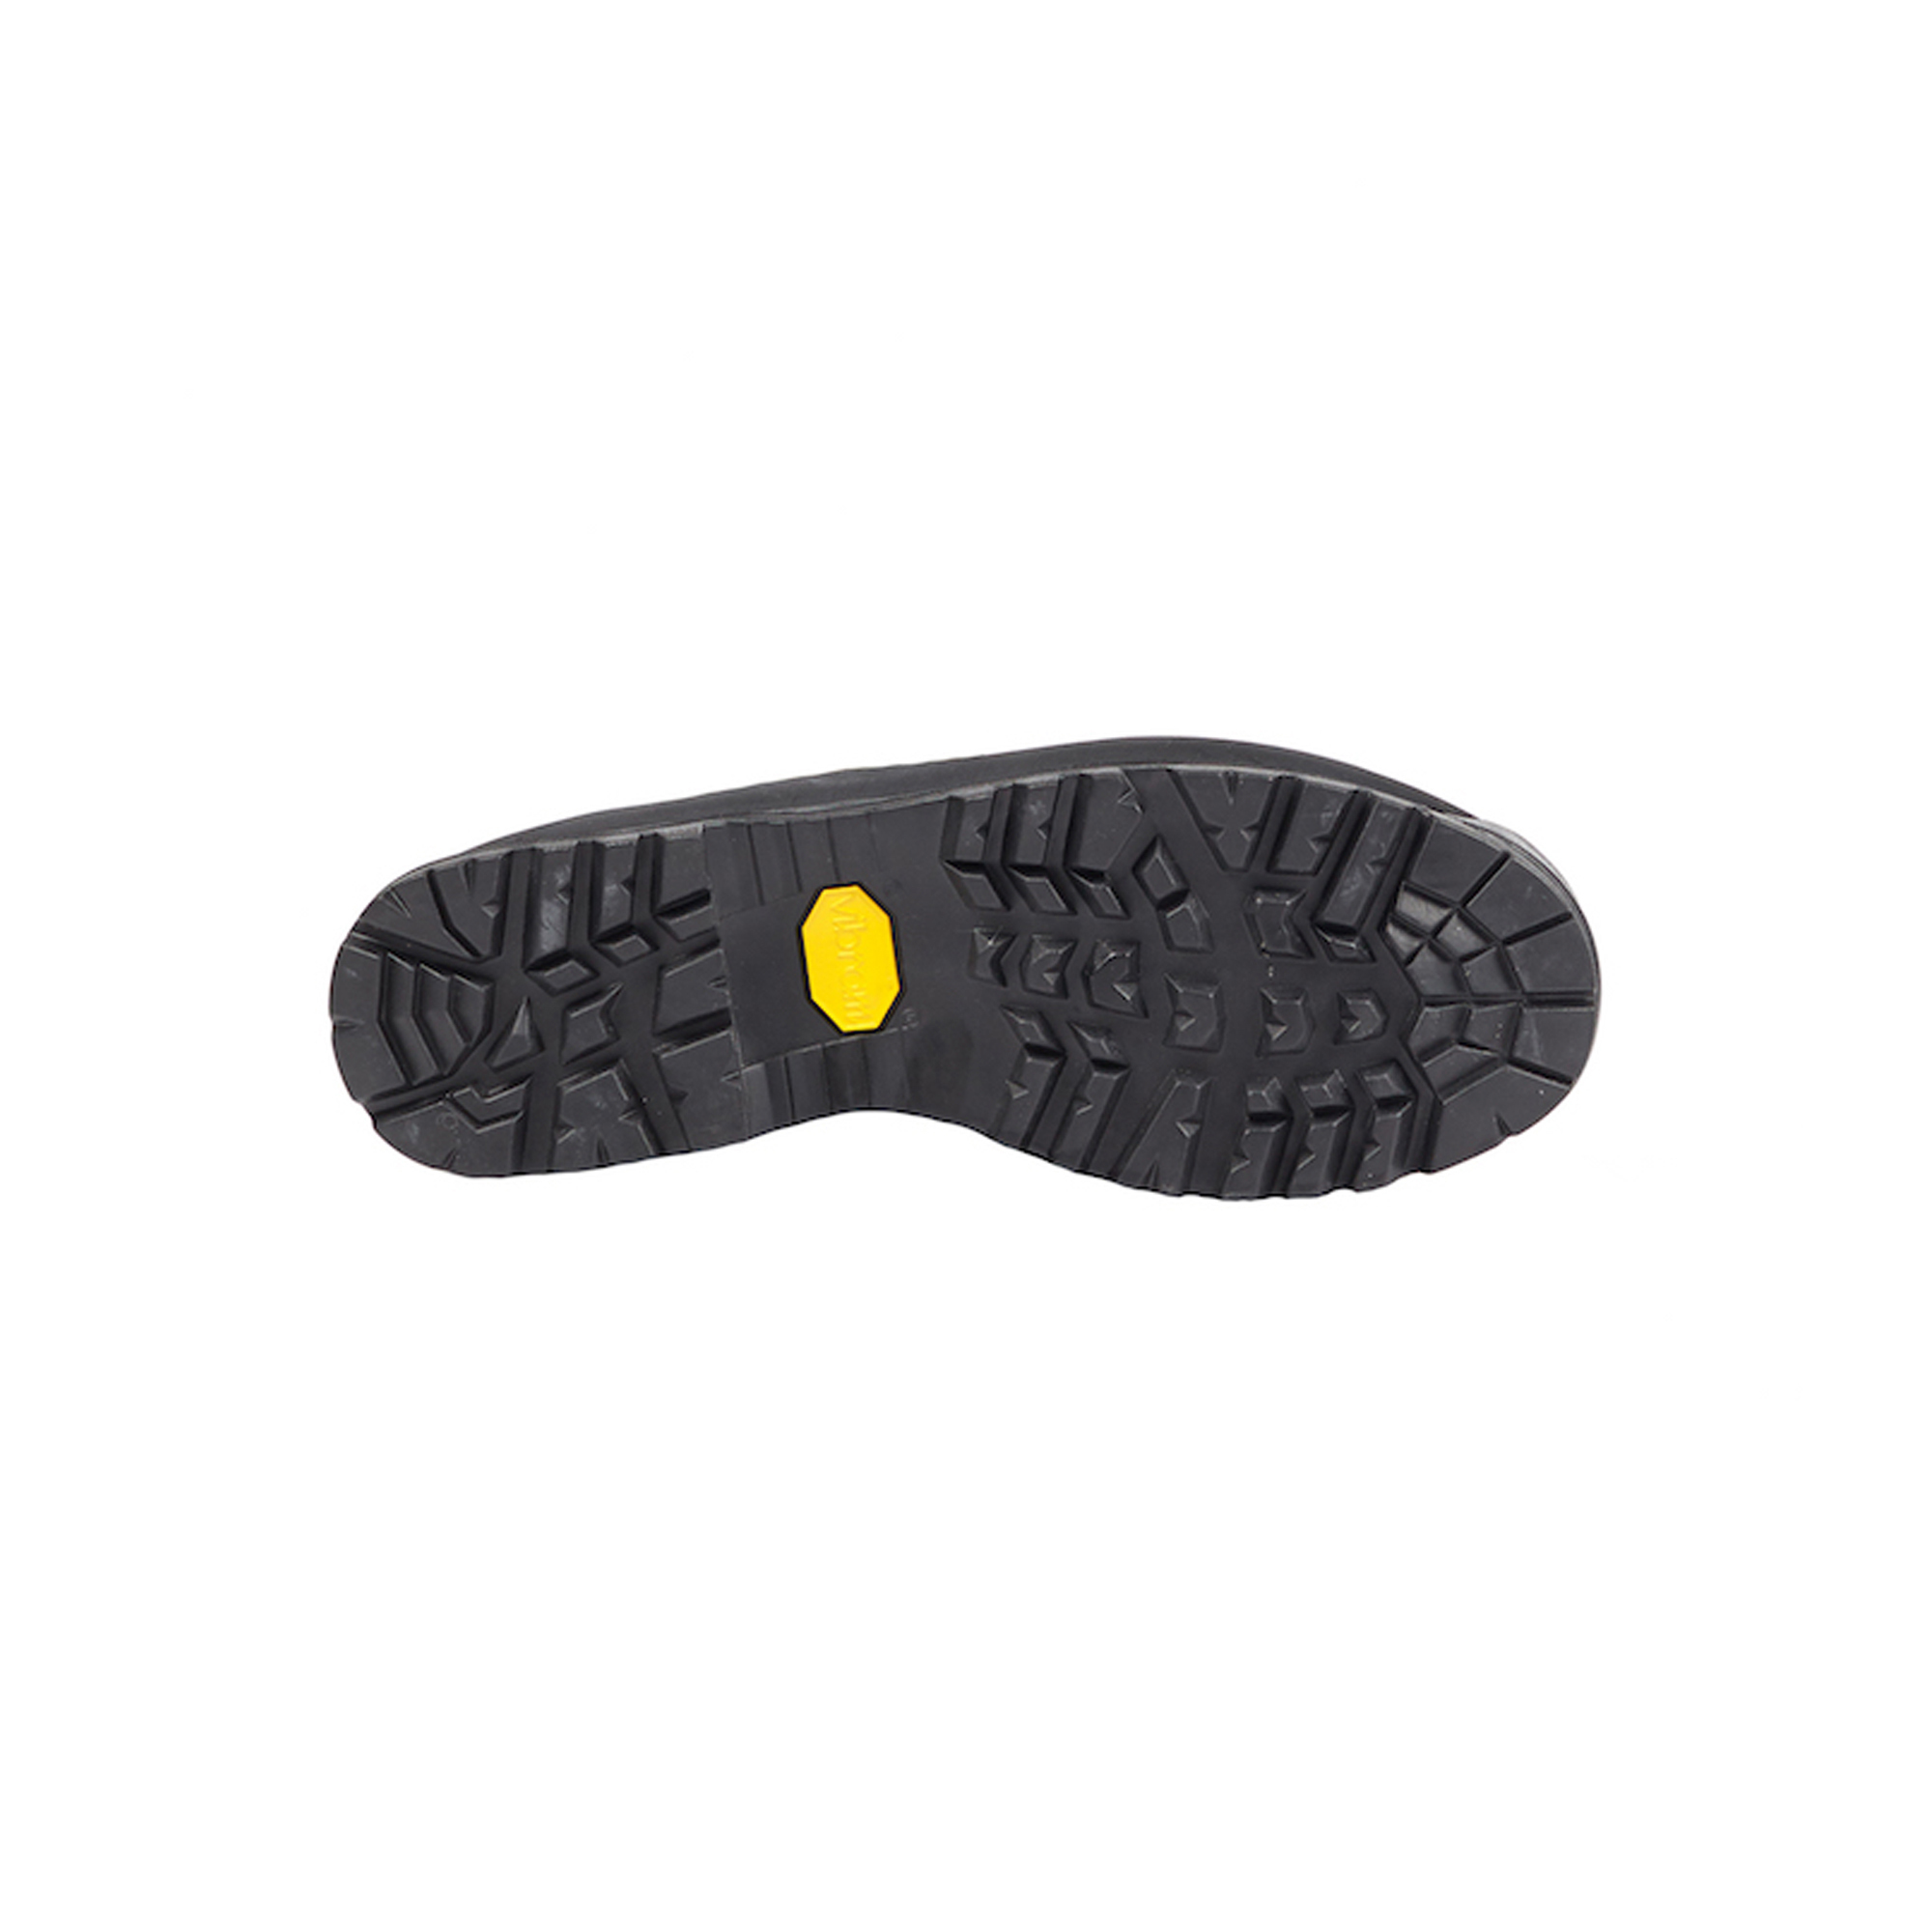 Aigle Tex® Catalog Homme Gore Storefront Fr Chaussures Zwz64qWtx5